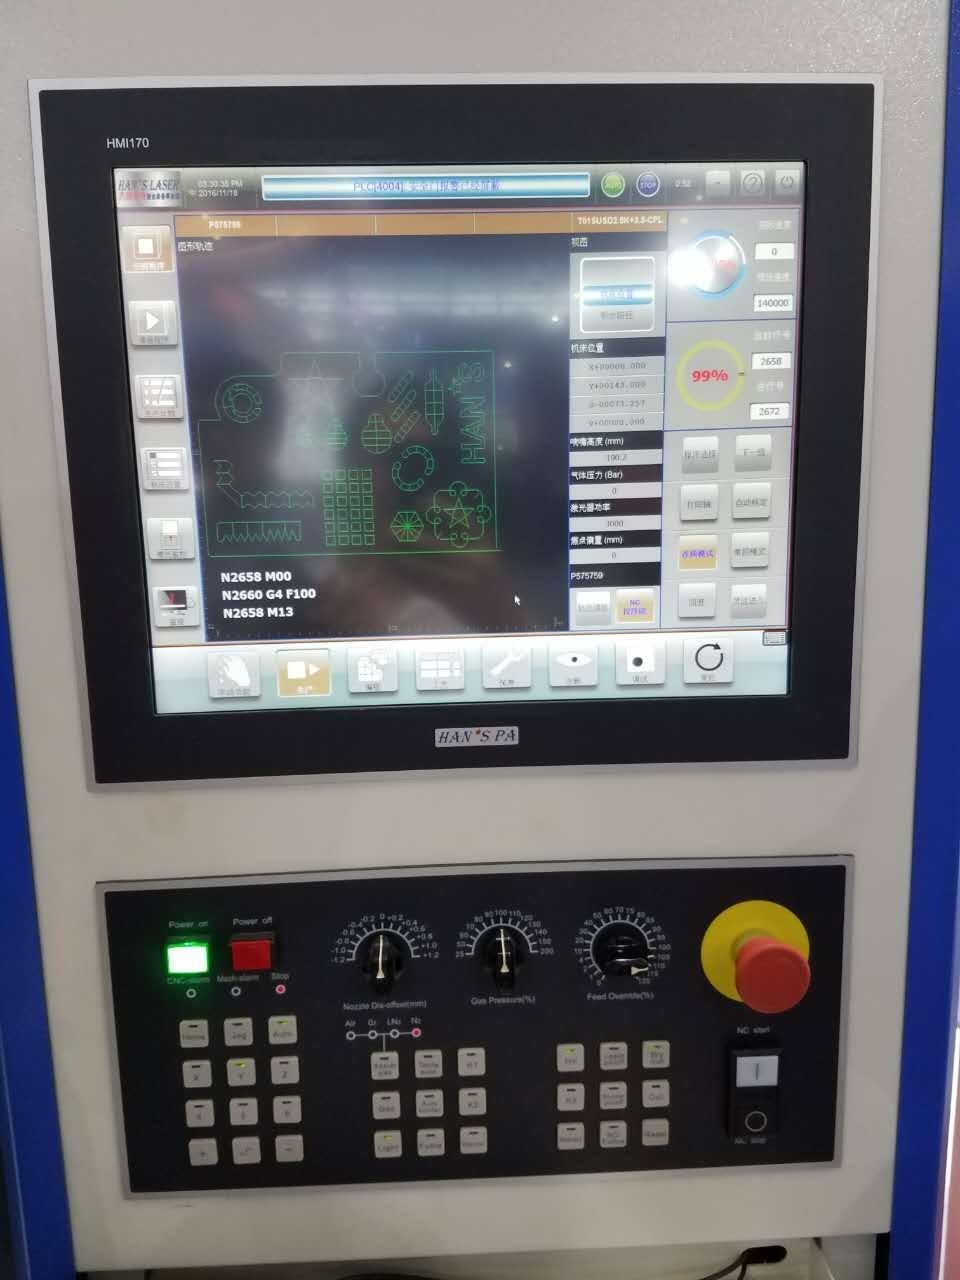 PA8000 installation